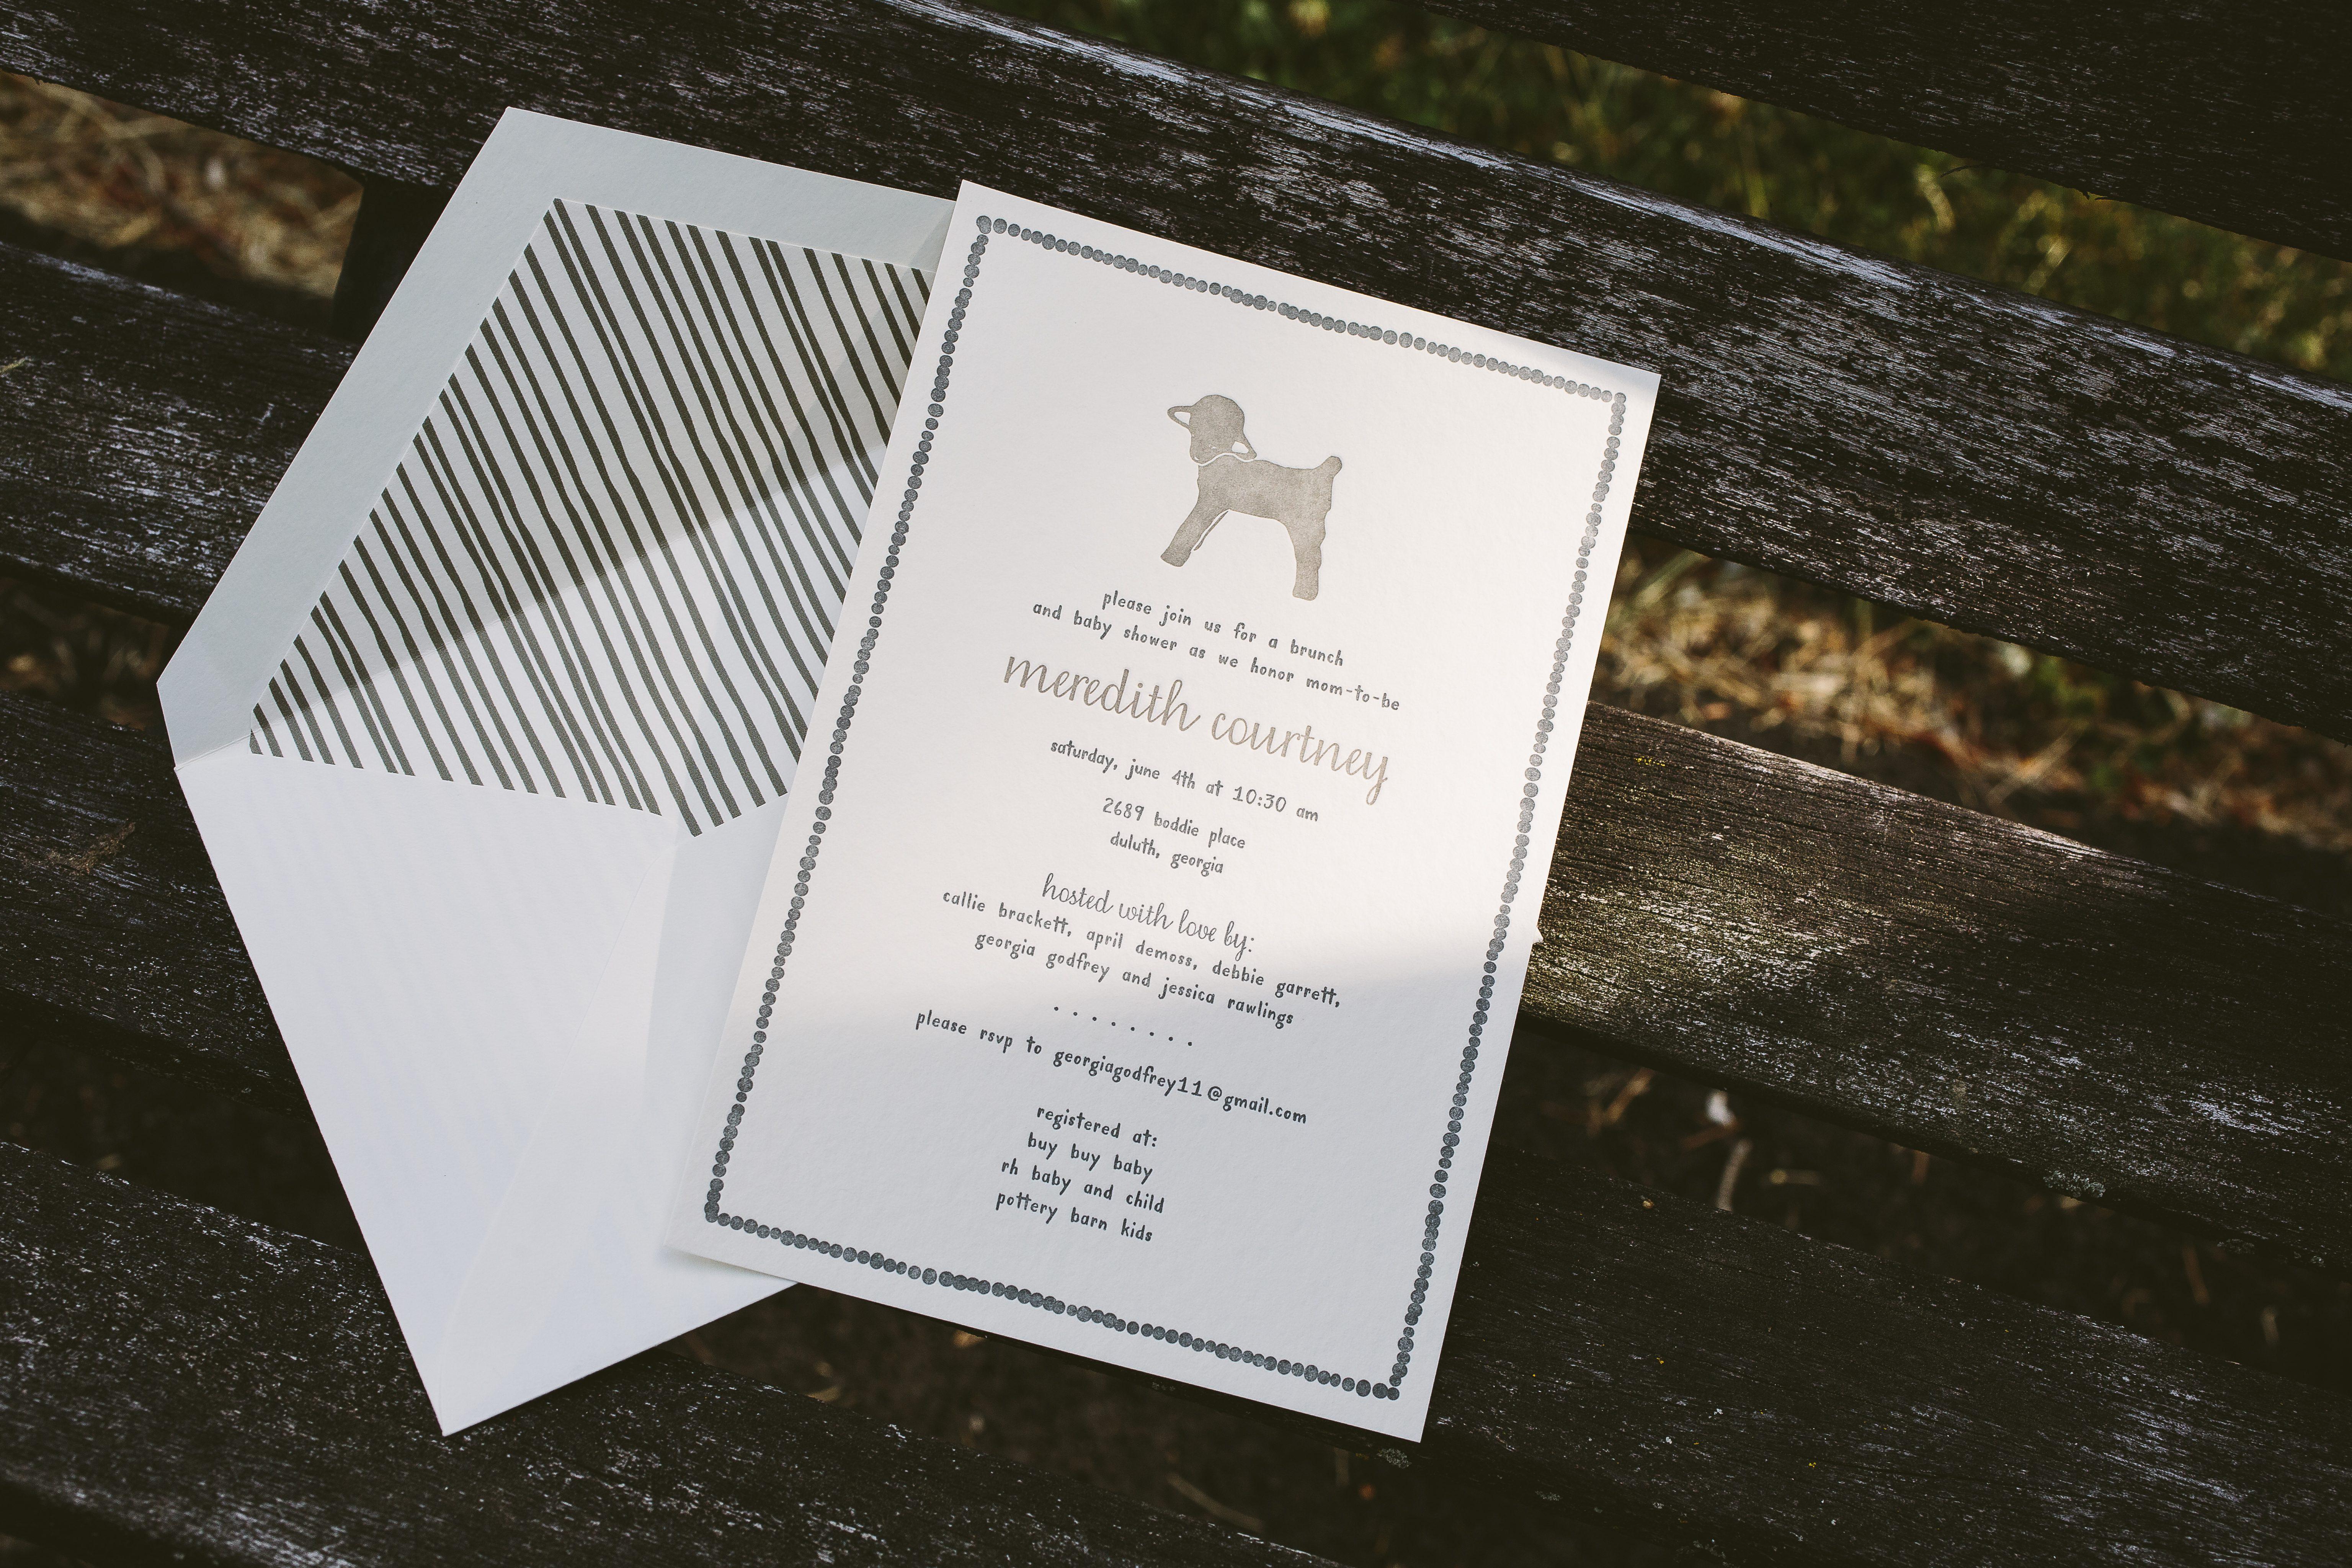 Little lamb gender neutral baby shower invitations from Smock - Smock.